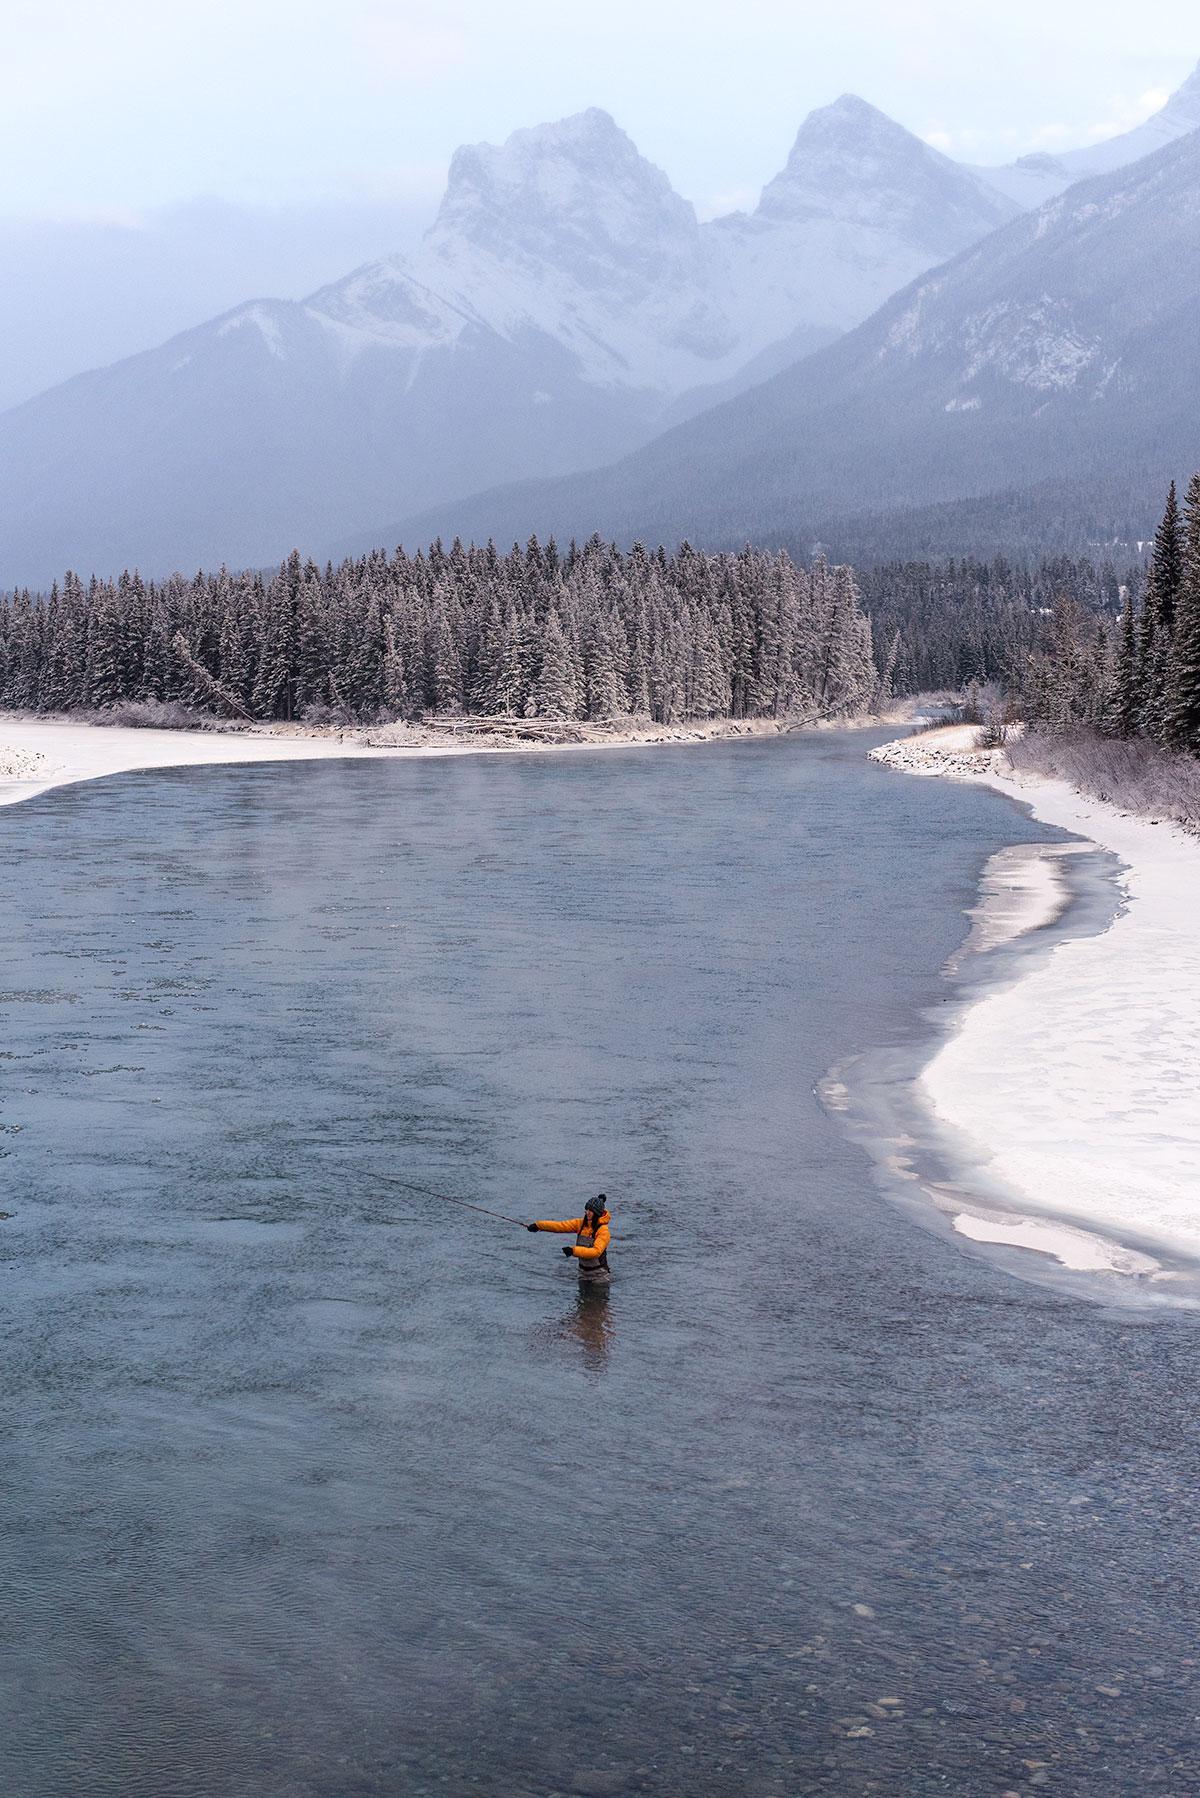 austin-trigg-patagonia-banff-alberta-winter-bow-river-anmore-canada-mountains-fly-fishing-sunset.jpg